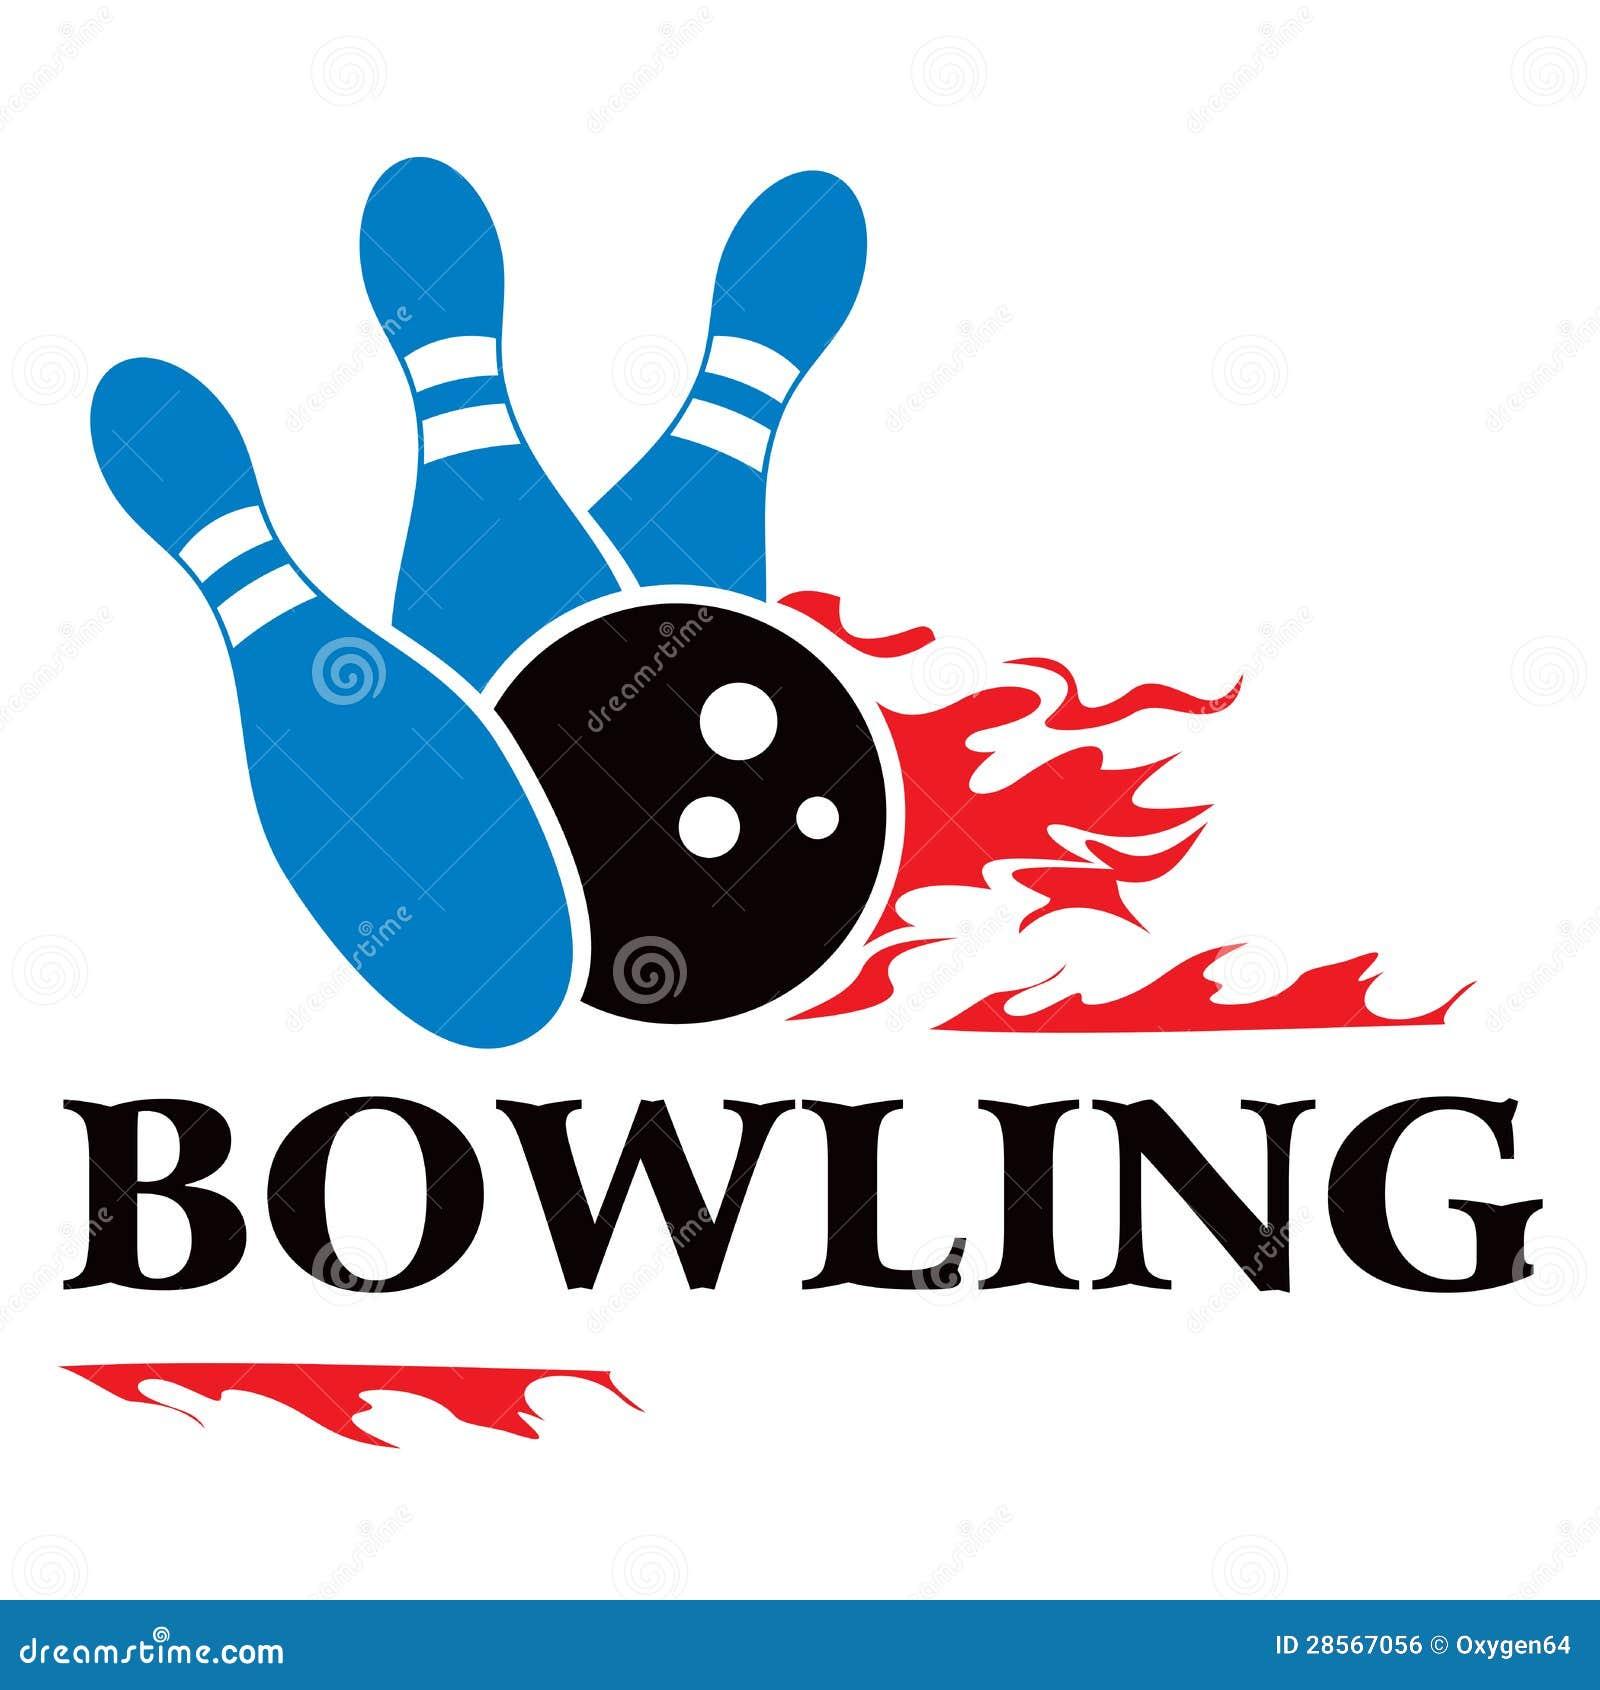 Bowling Symbol Royalty Free Stock Image Image 28567056